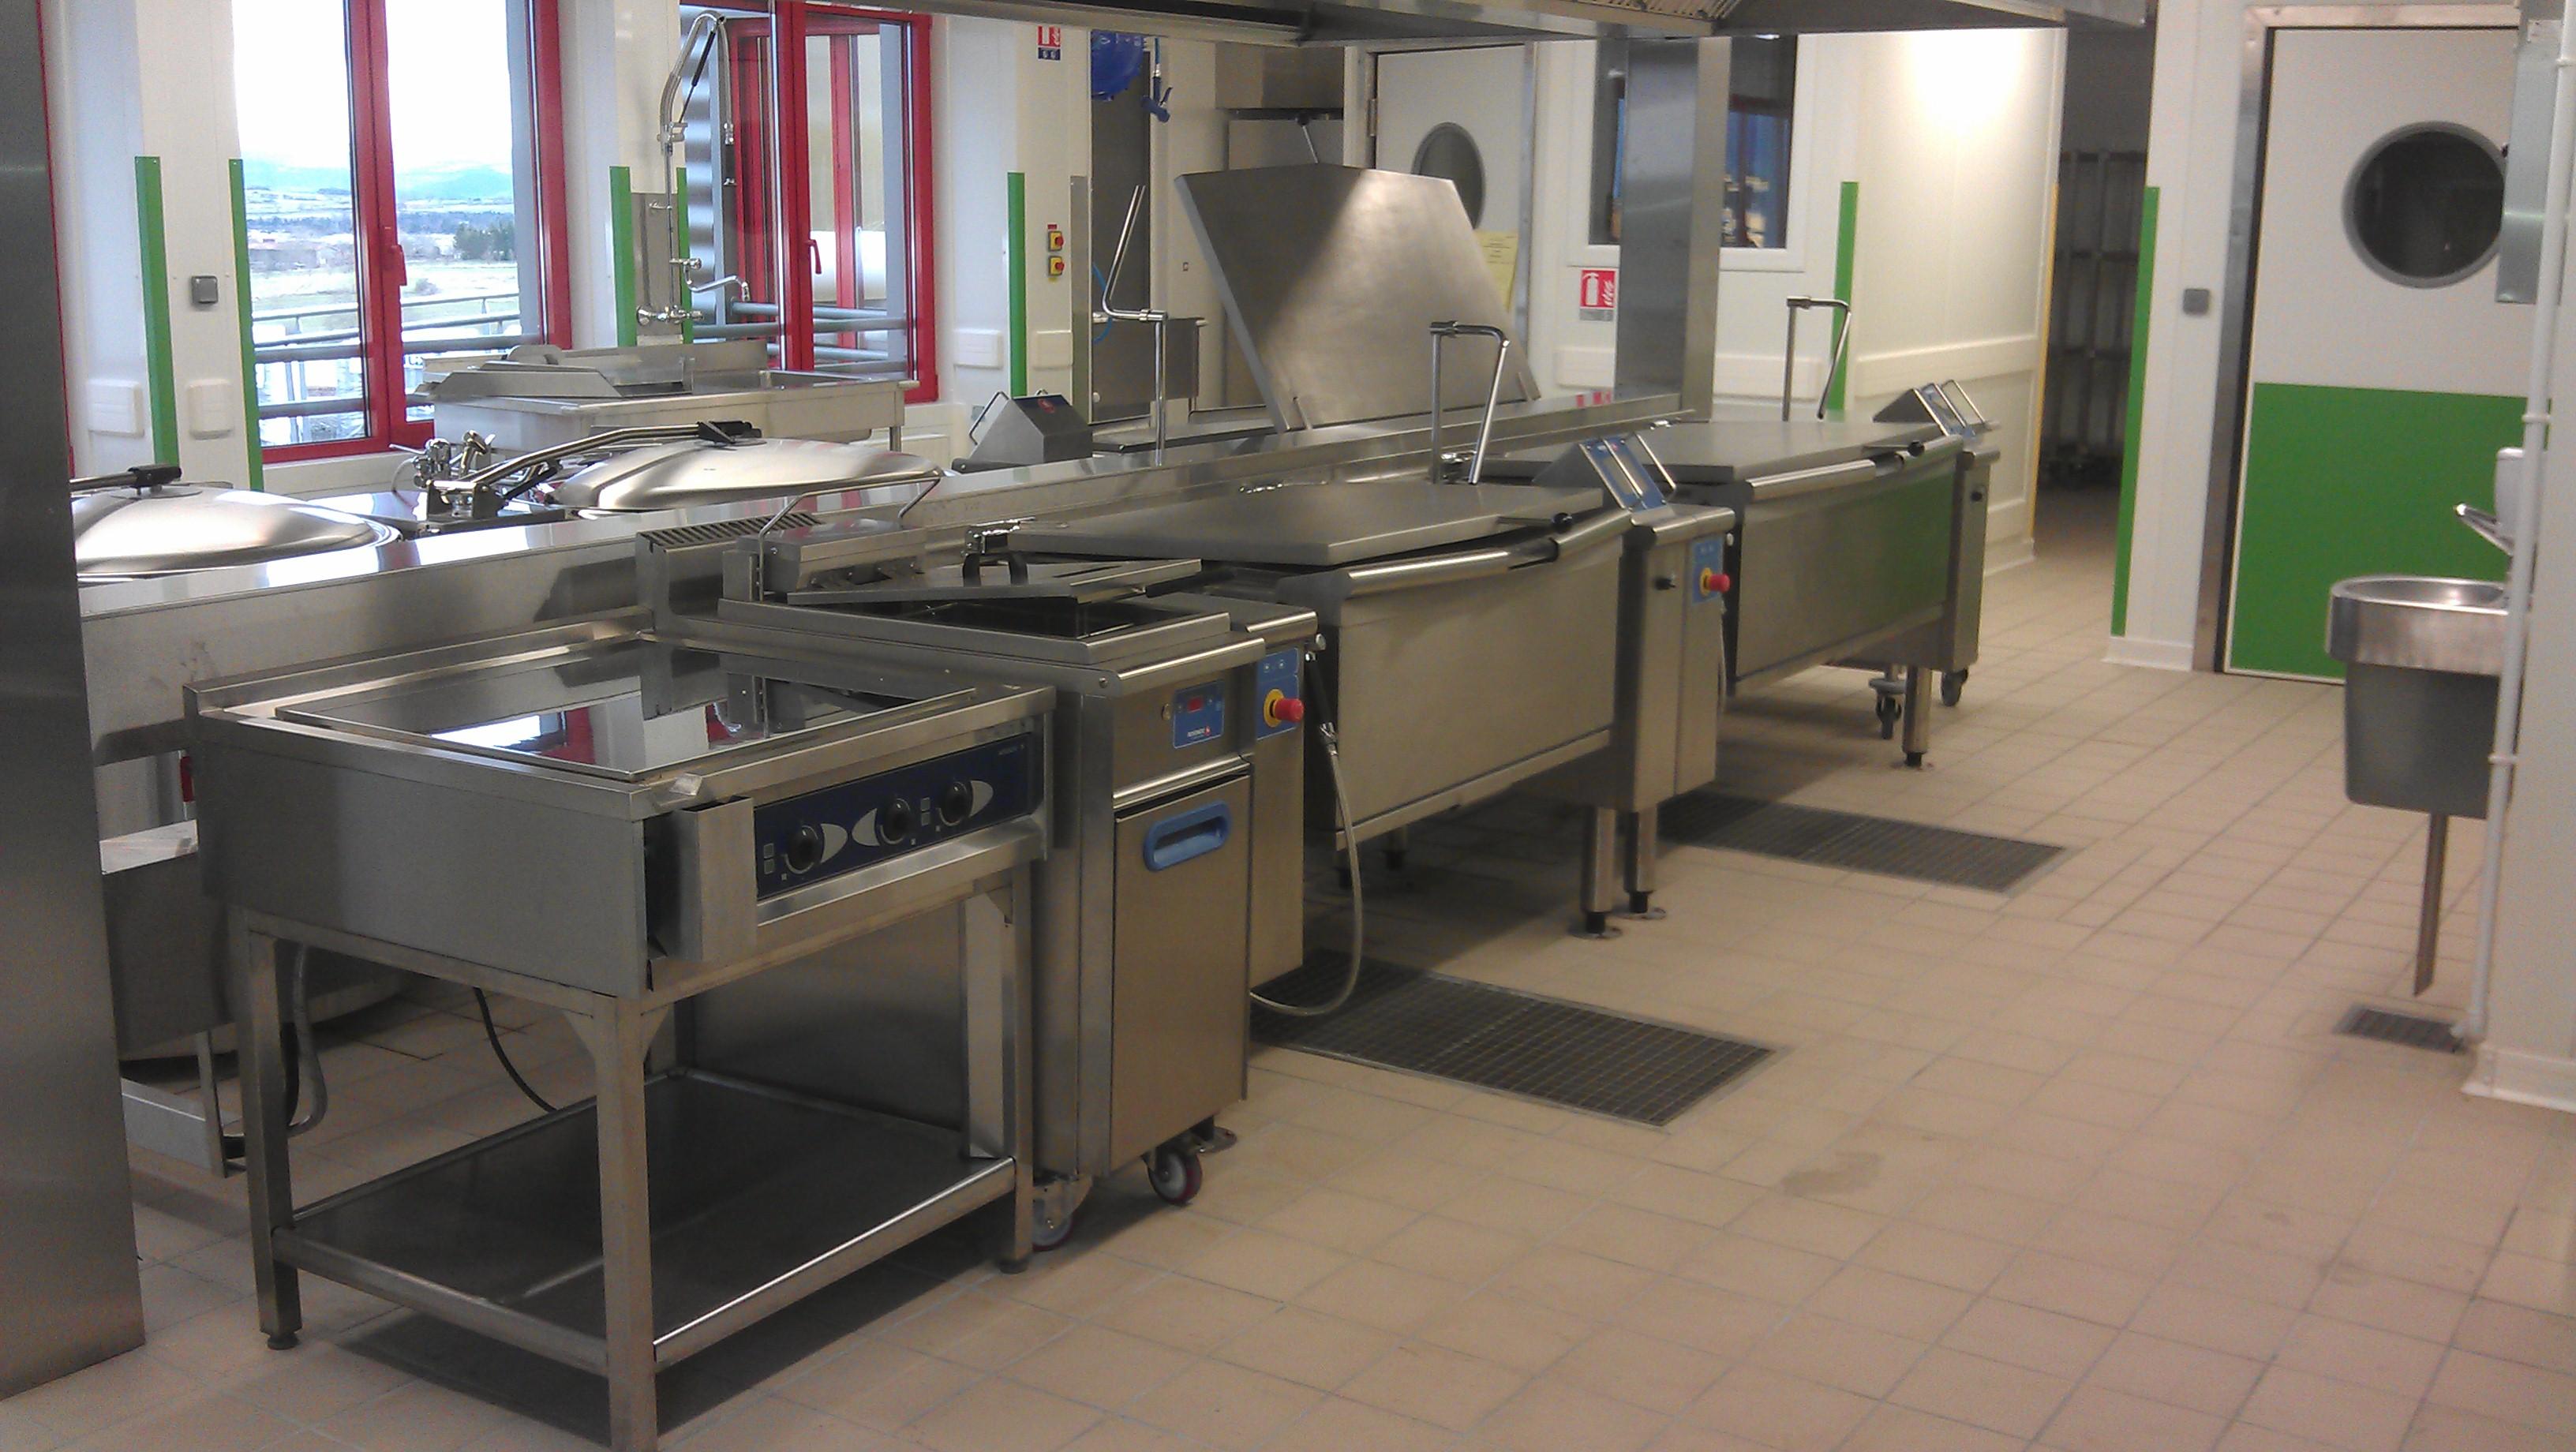 Cuisine centrale froid equipement service for Cuisine centrale